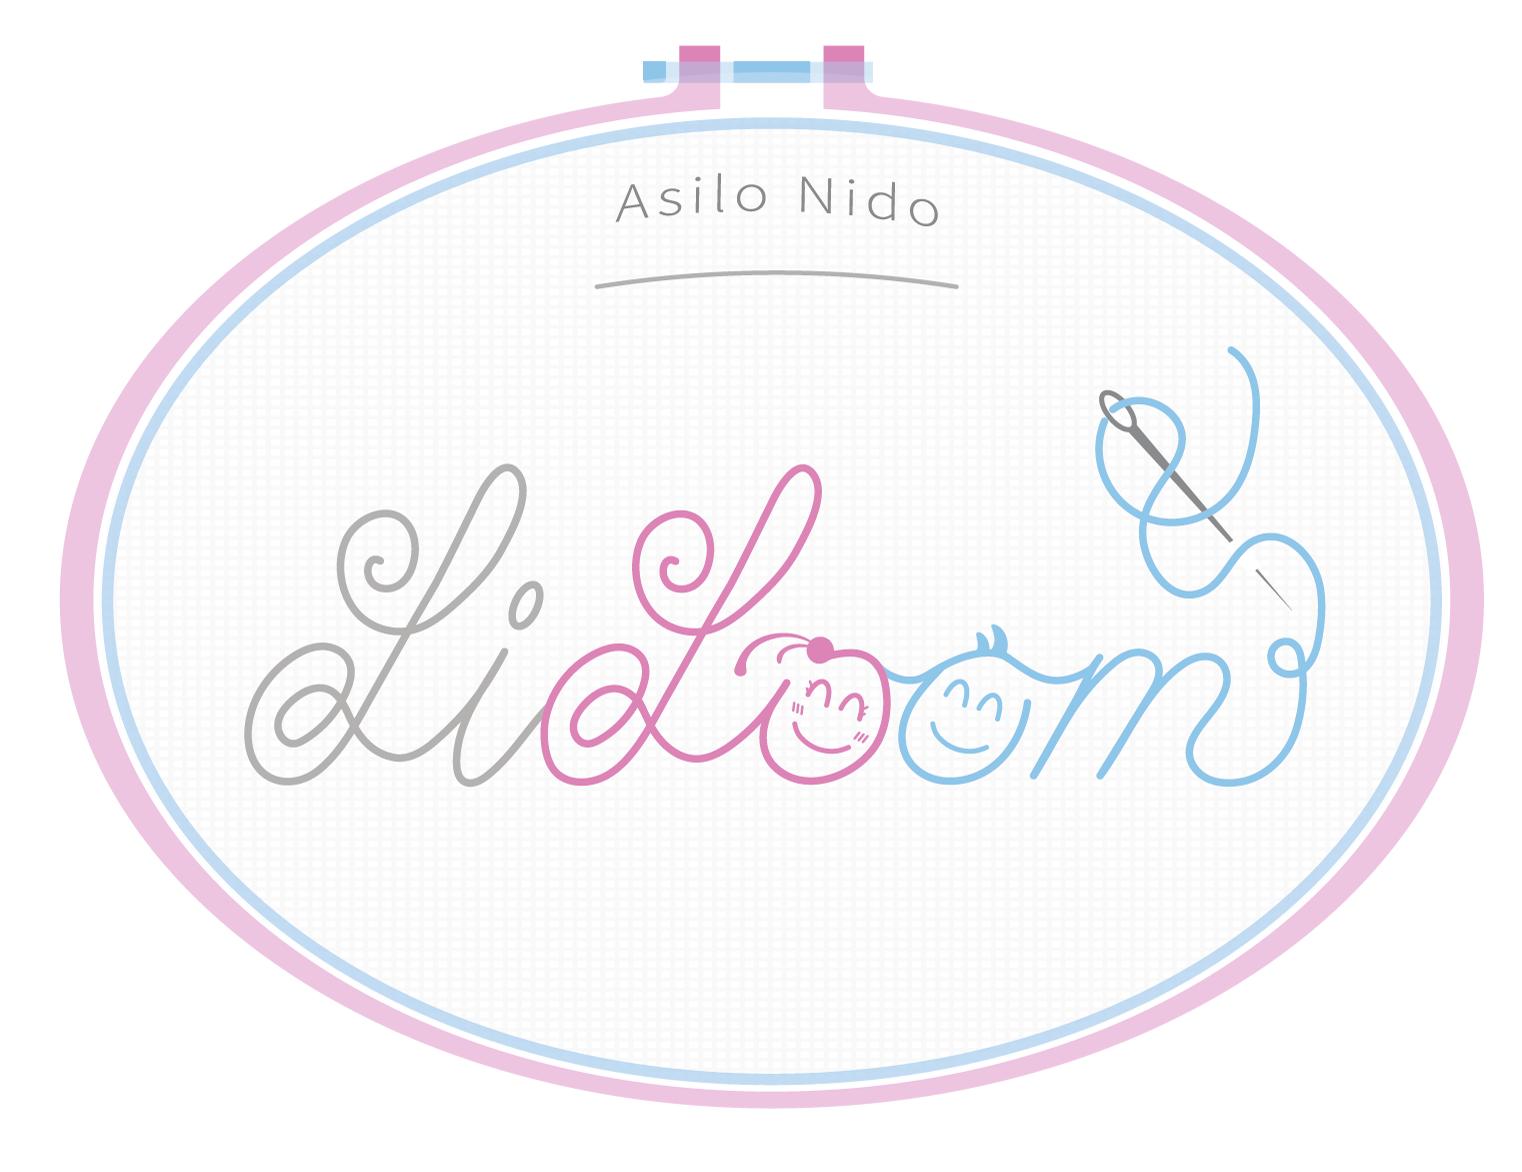 Asilo Nido Milano - LiLoom